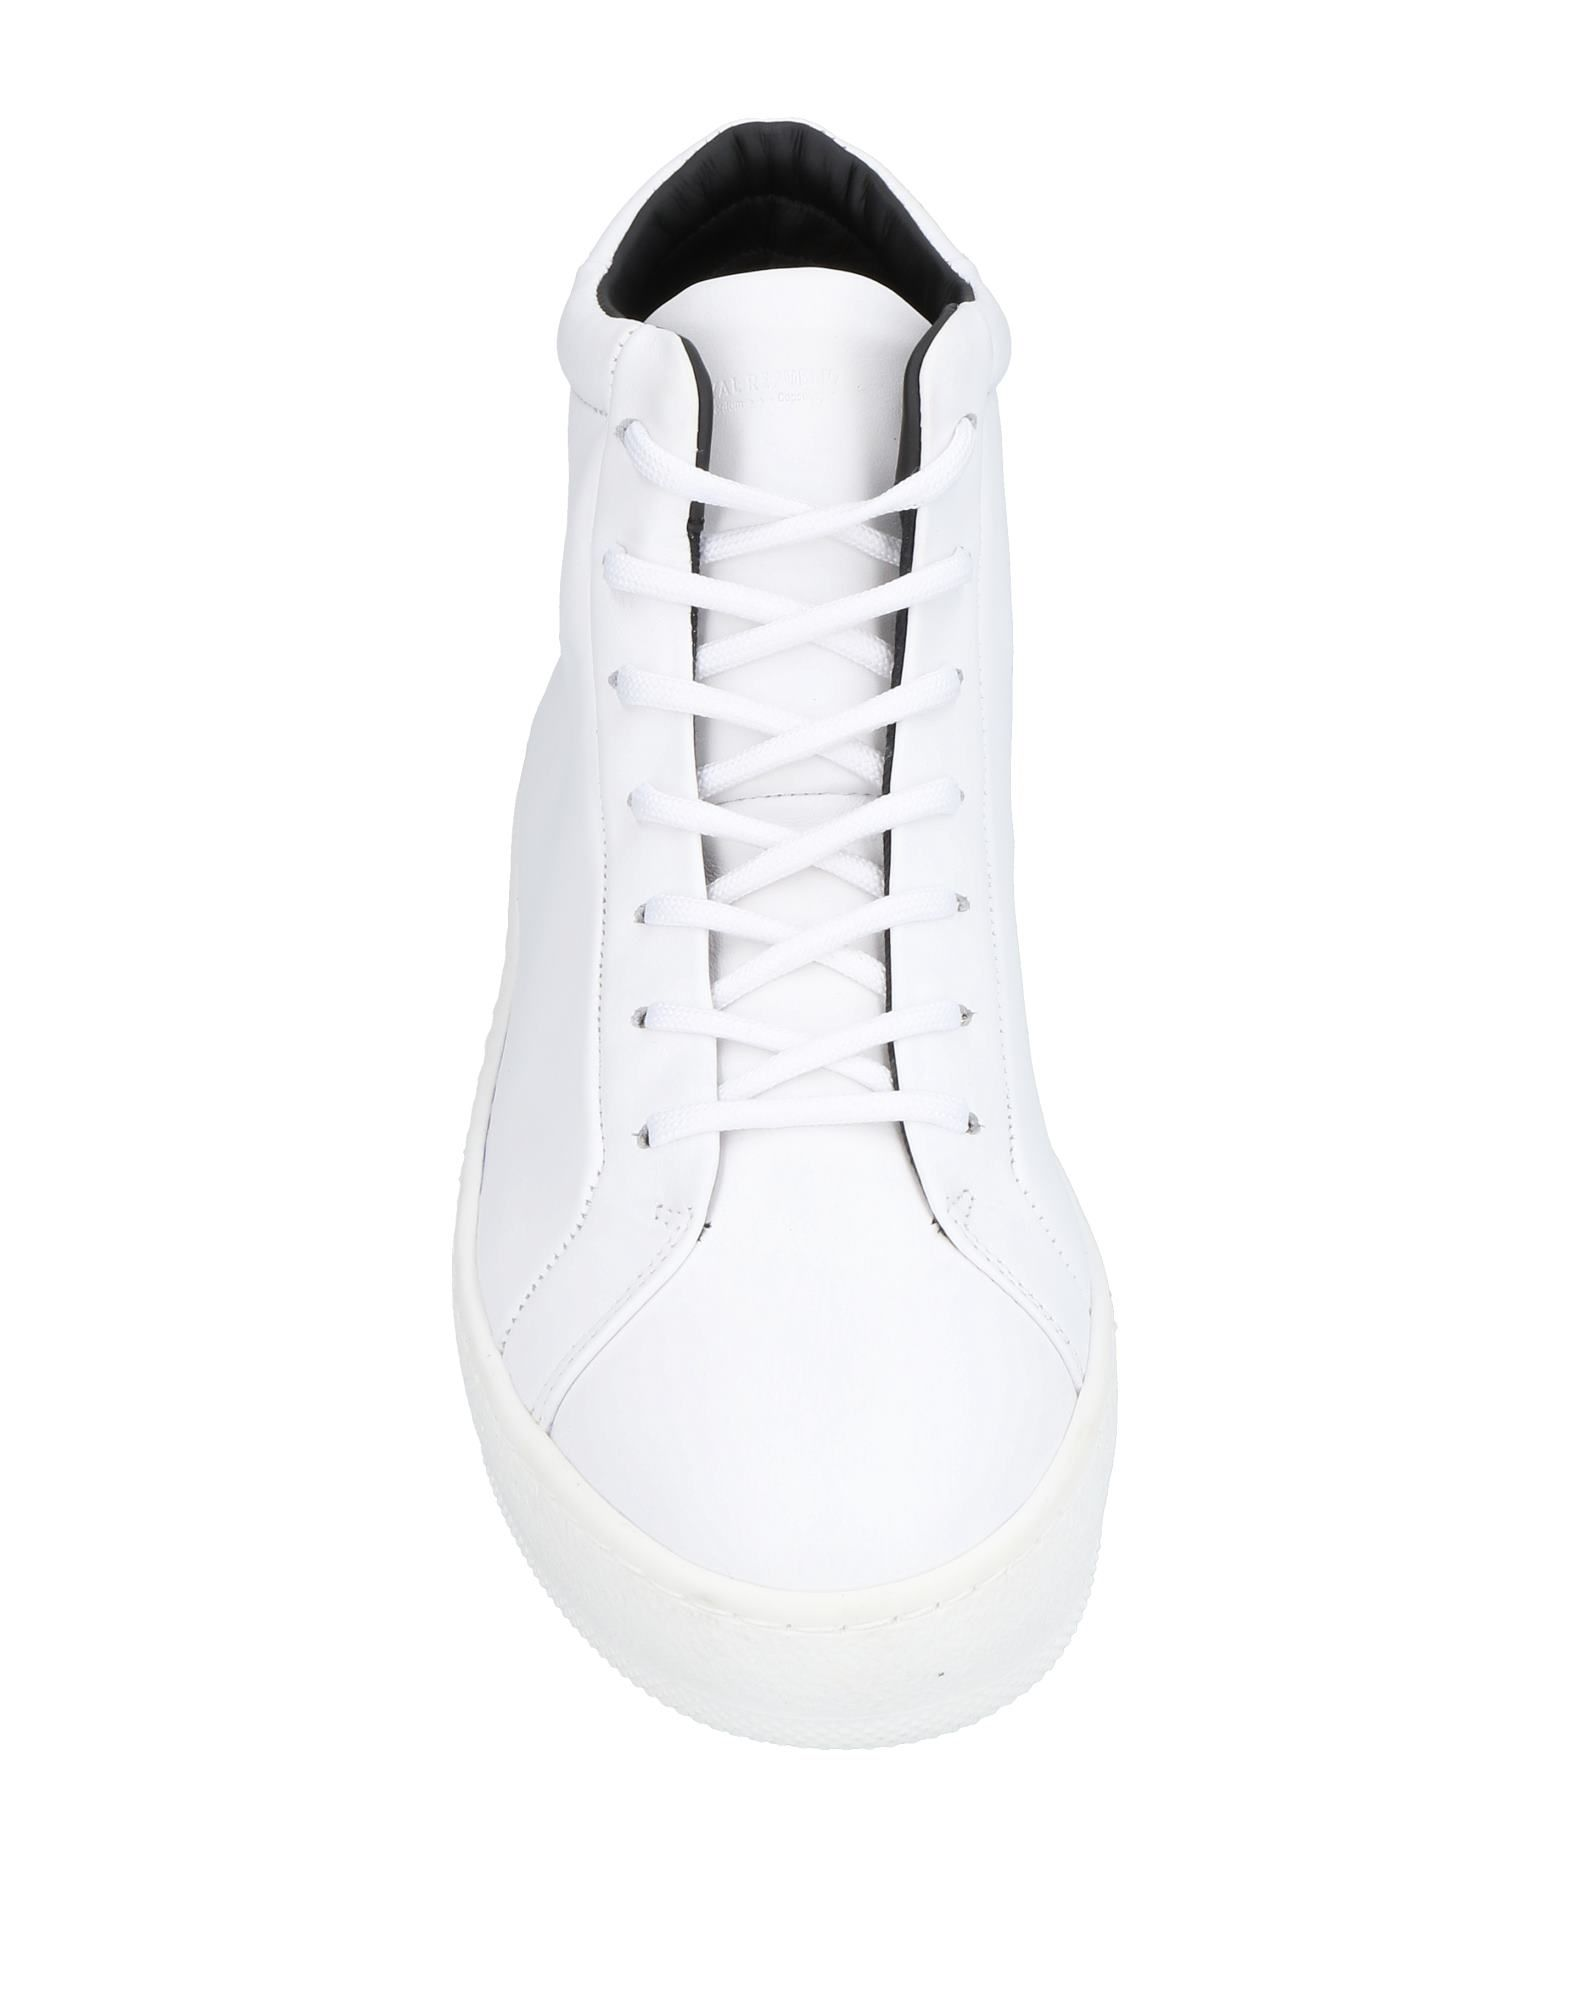 Stilvolle Sneakers billige Schuhe Royal Republiq Sneakers Stilvolle Damen  11460821PN 203ecd